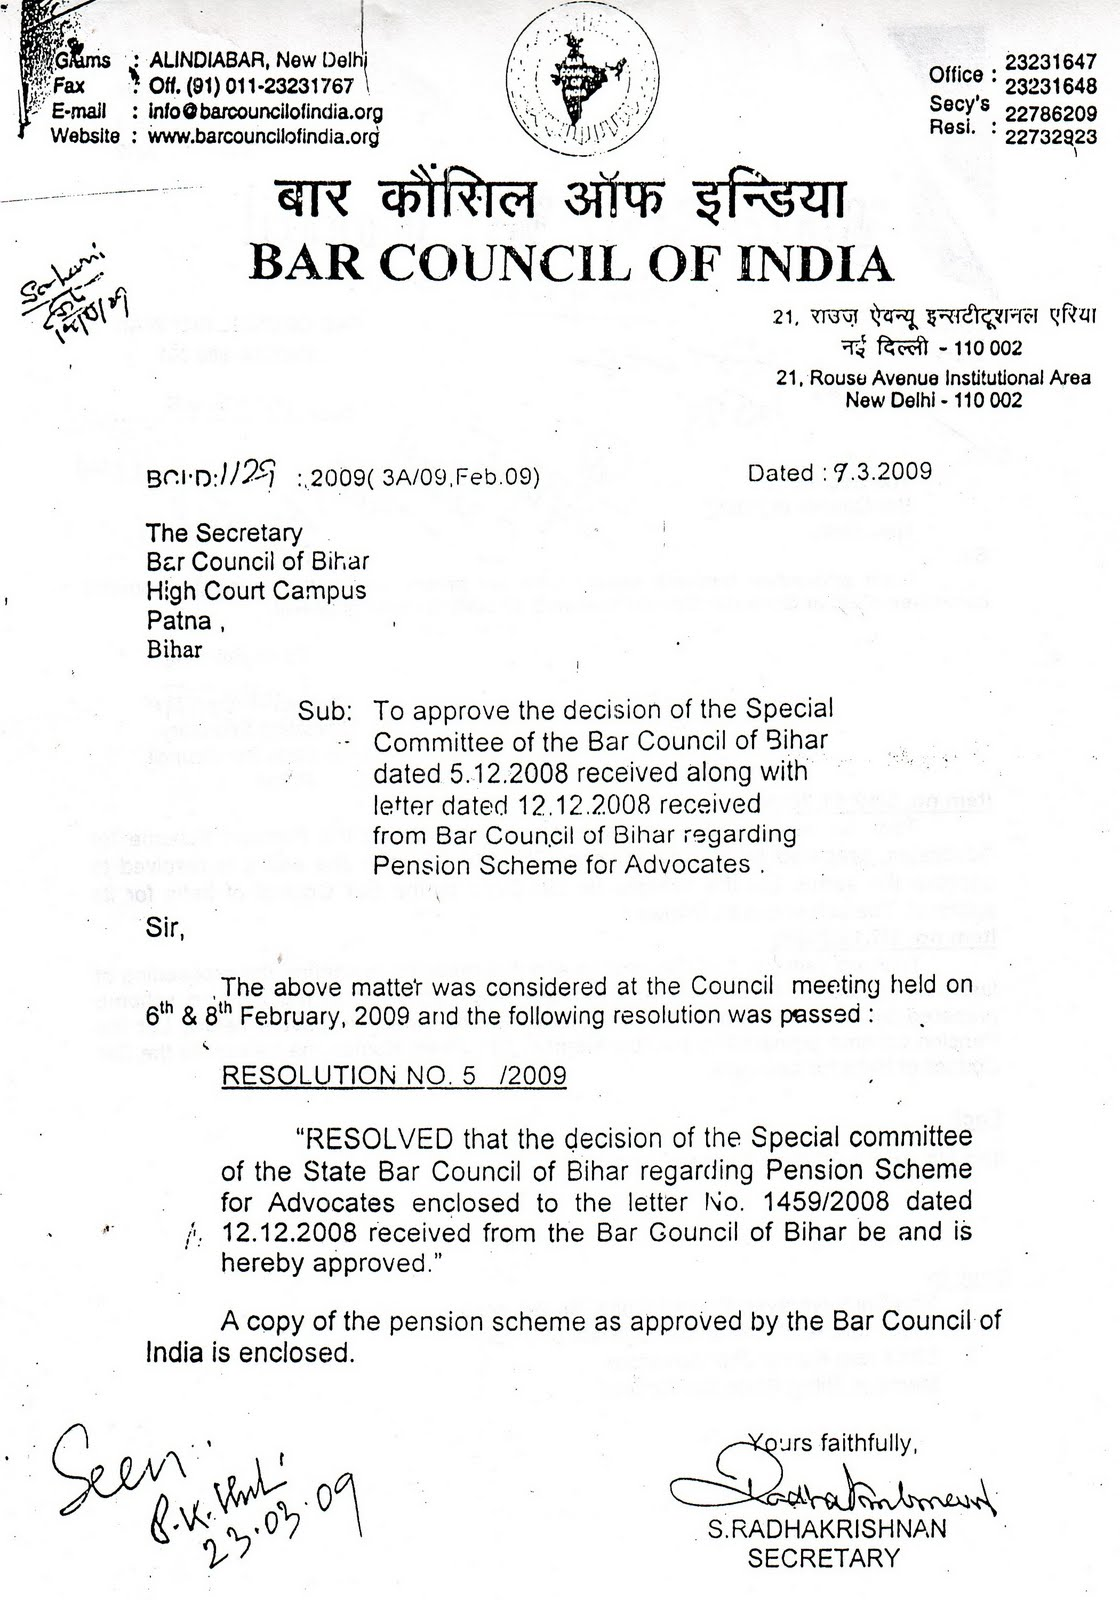 Bihar State Bar Council Advocates Welfare Pension Scheme 2008